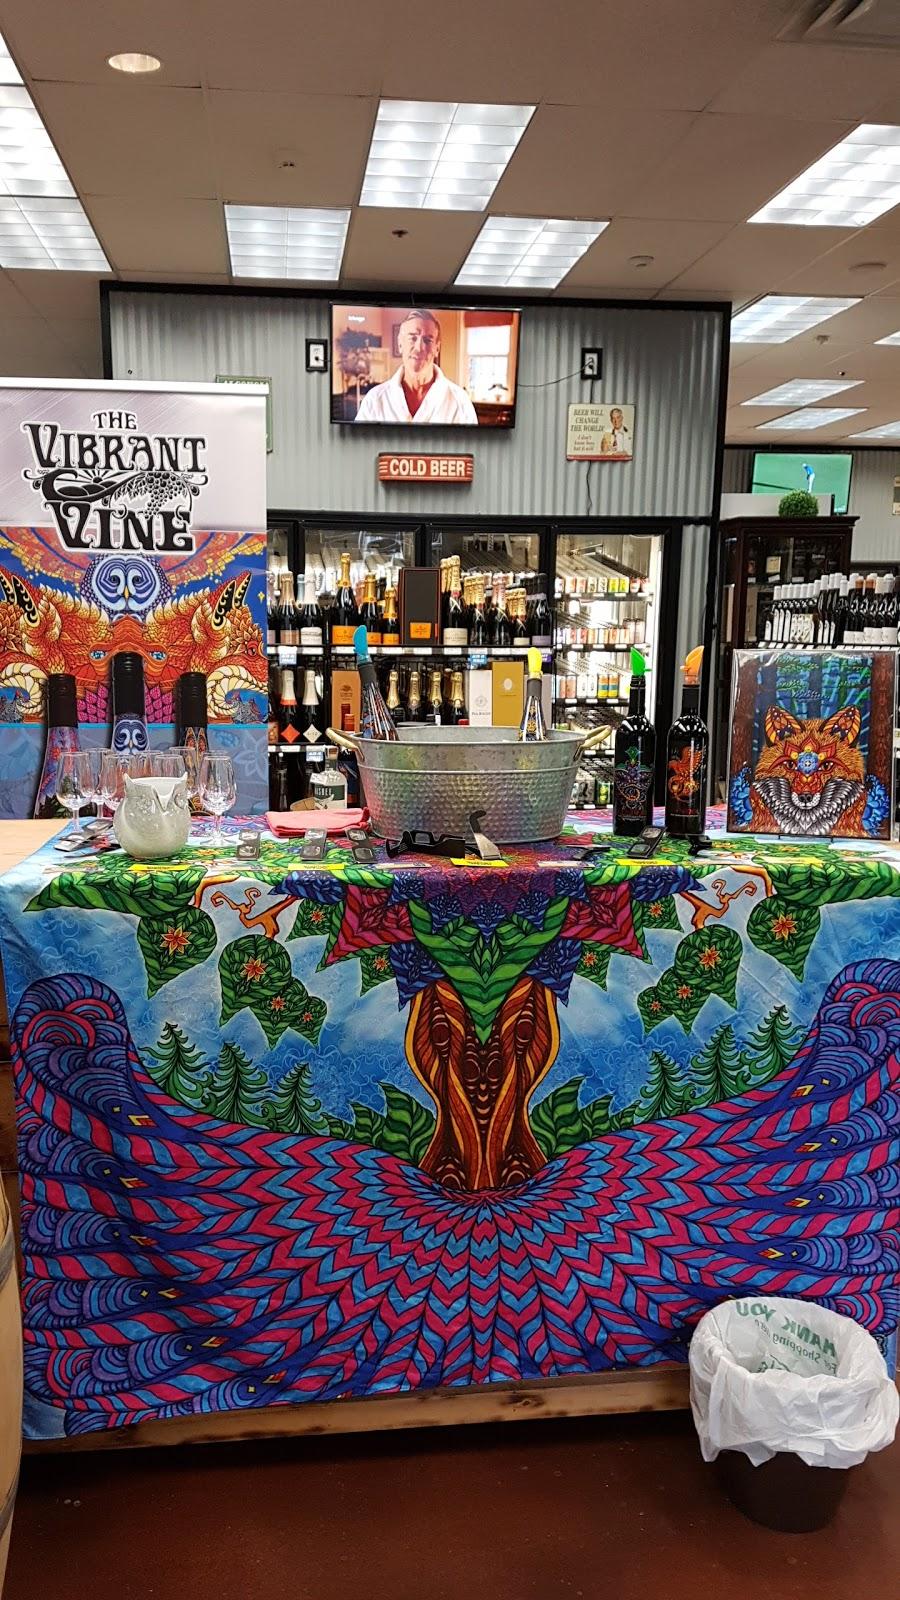 Urban Liquor Store | store | 2395 Gordon Dr Suite 106, Kelowna, BC V1W 3X7, Canada | 2508600364 OR +1 250-860-0364